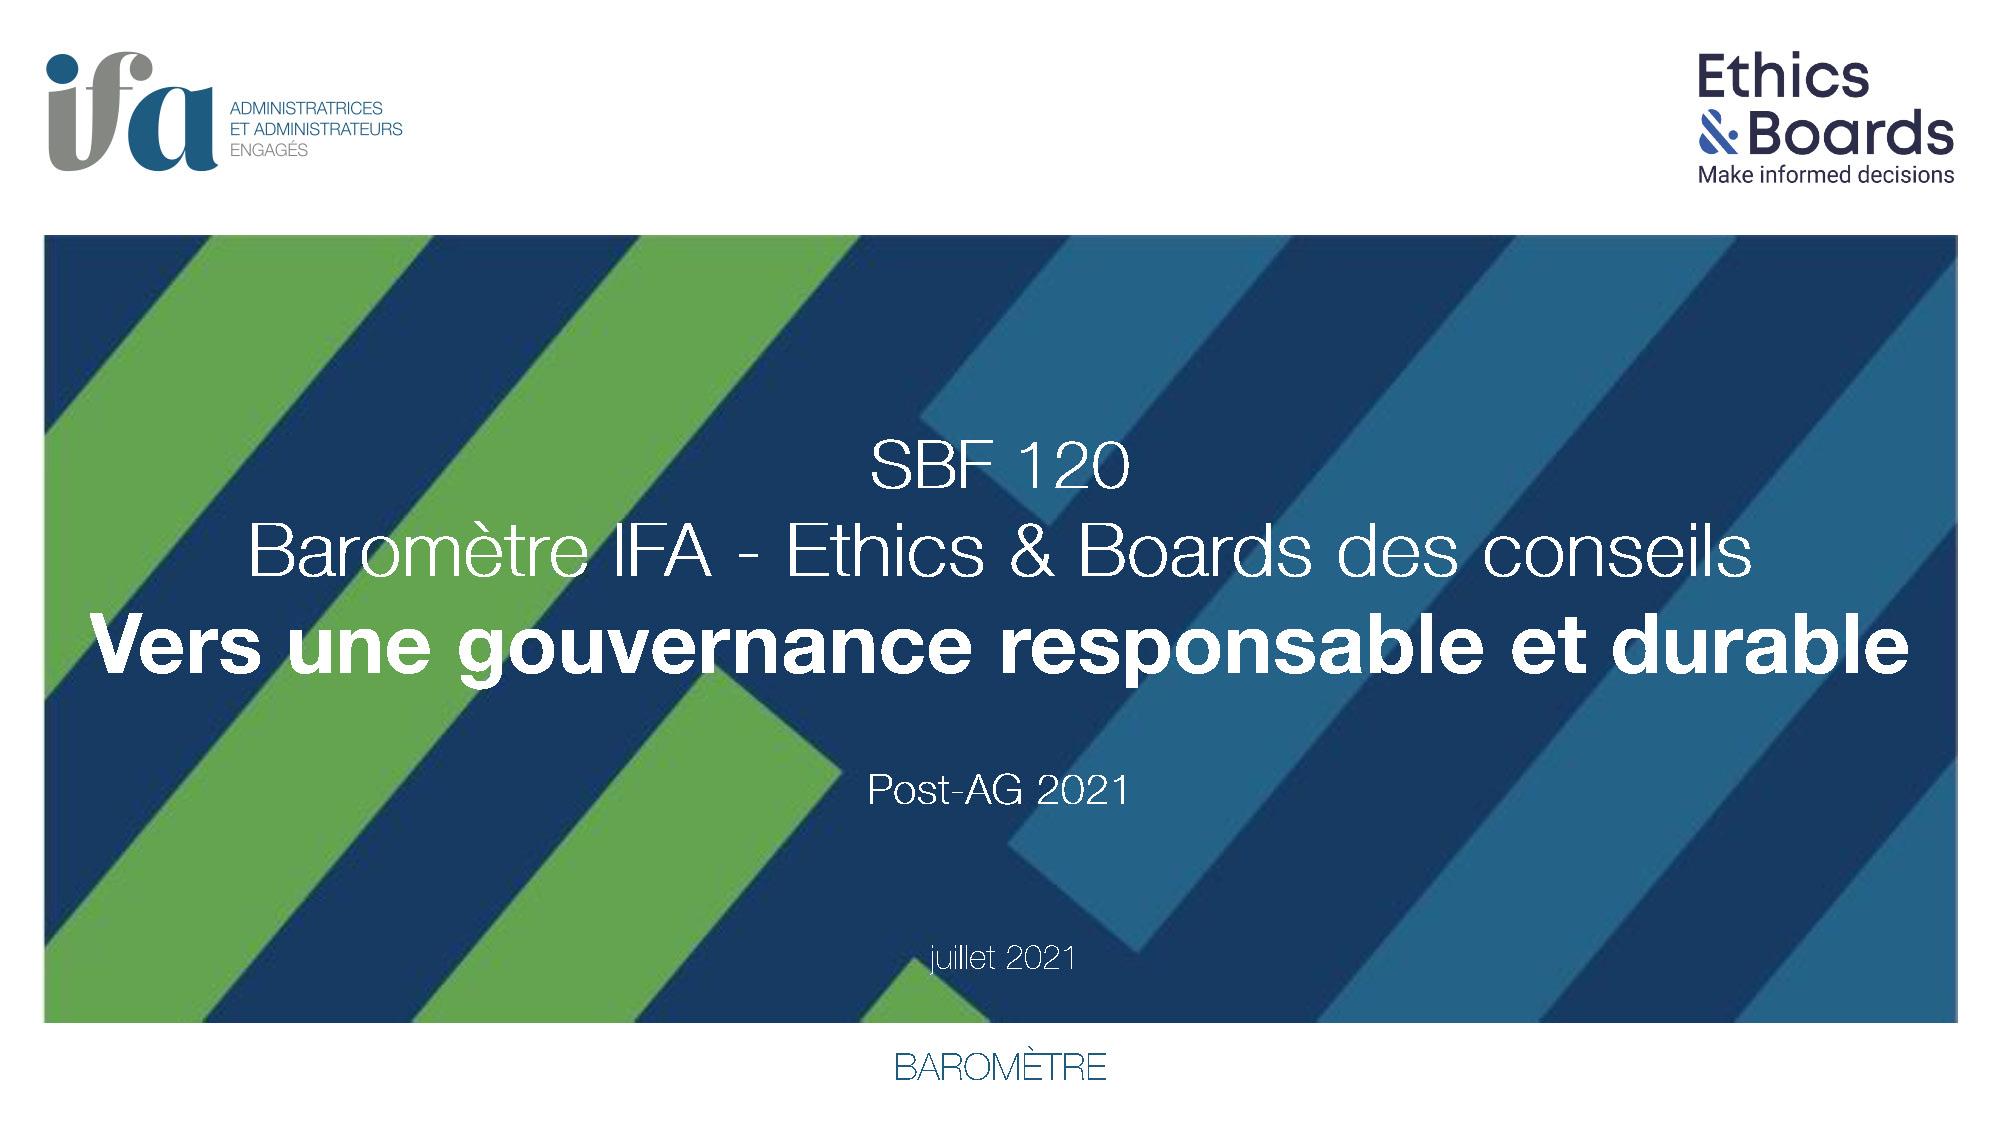 BAROMETRE IFA- ETHICS & BOARDS 2021